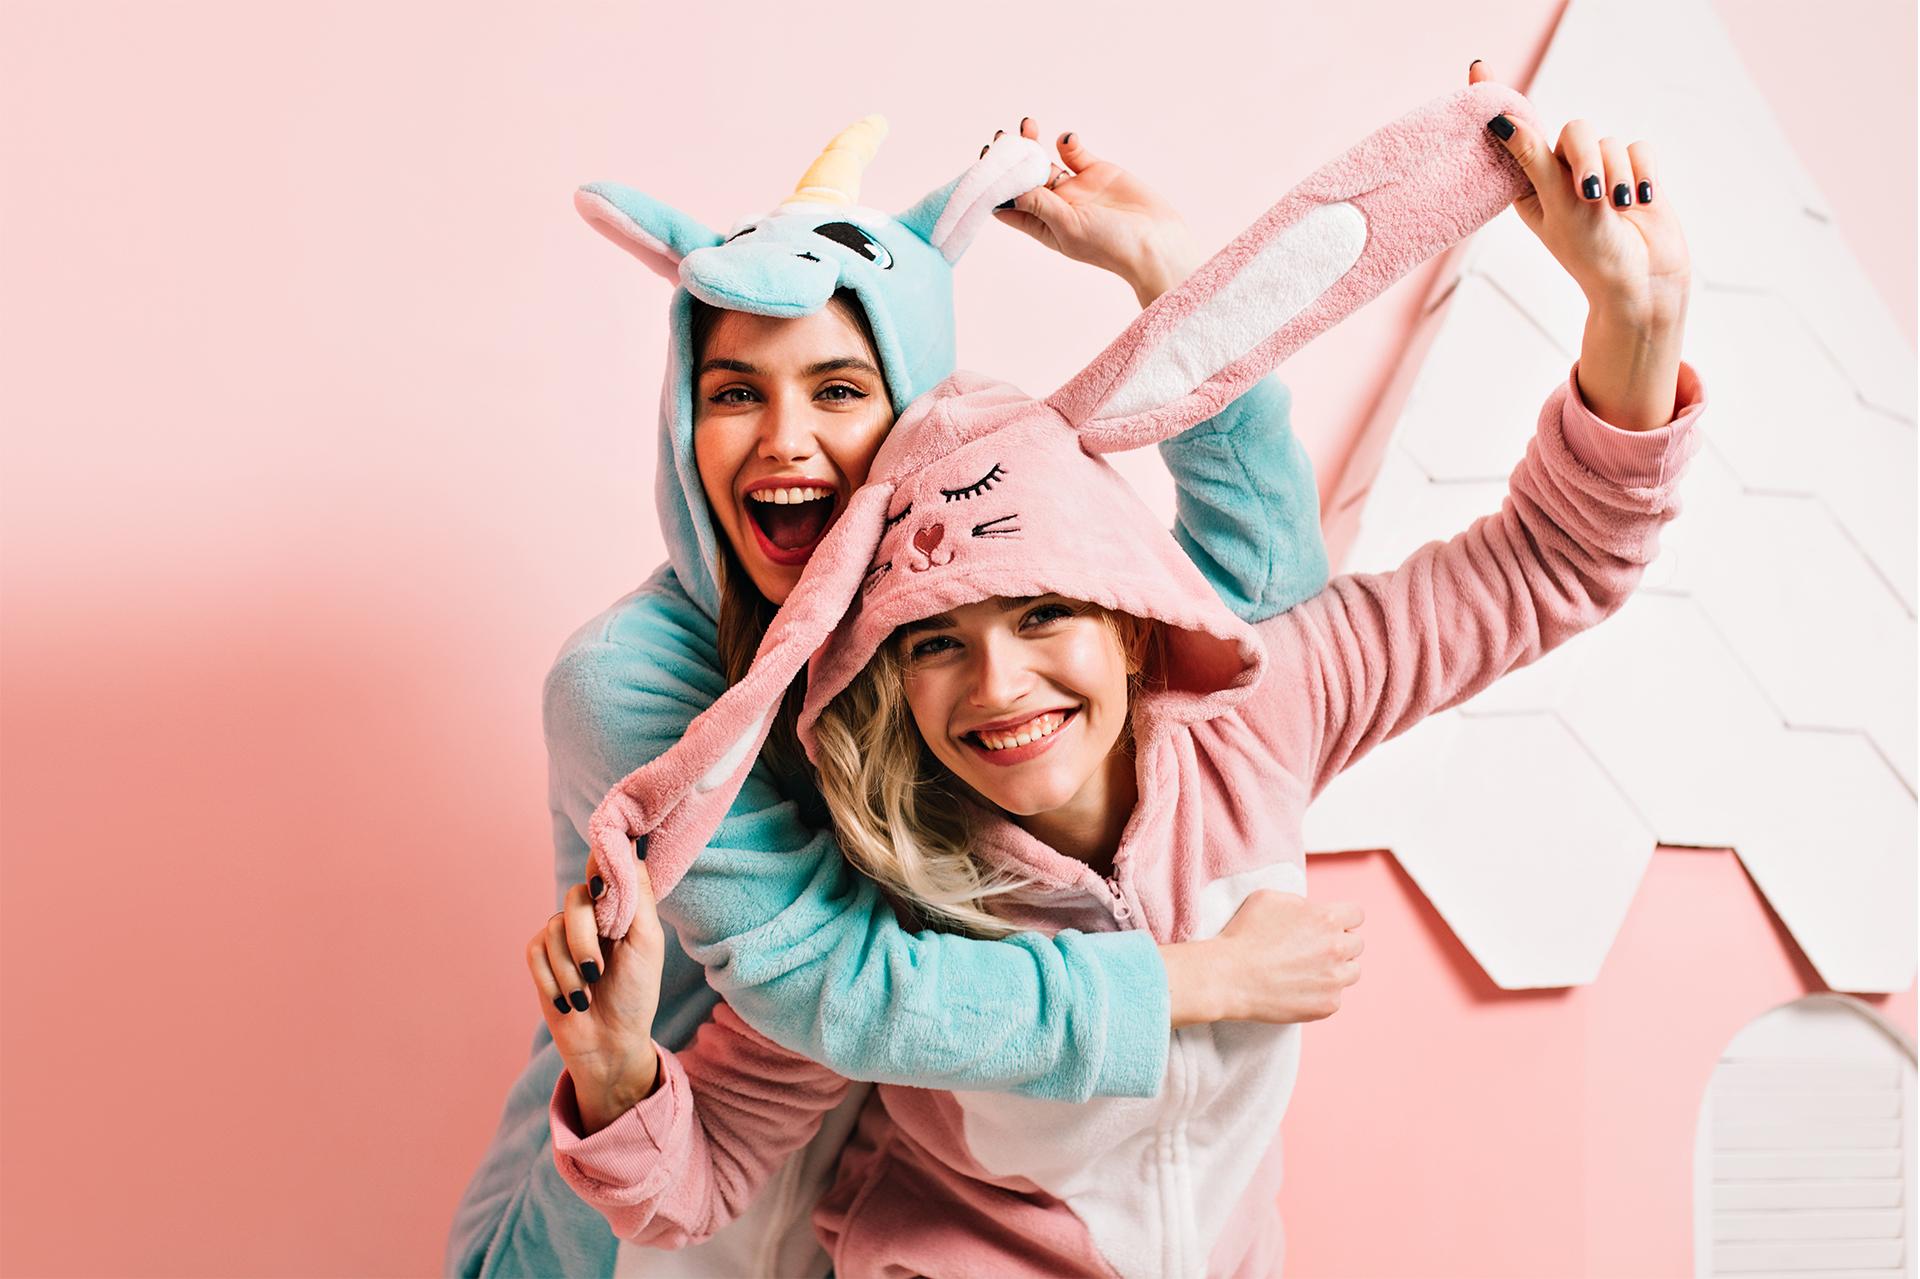 comment-organiser-une-soiree-pyjama-bg